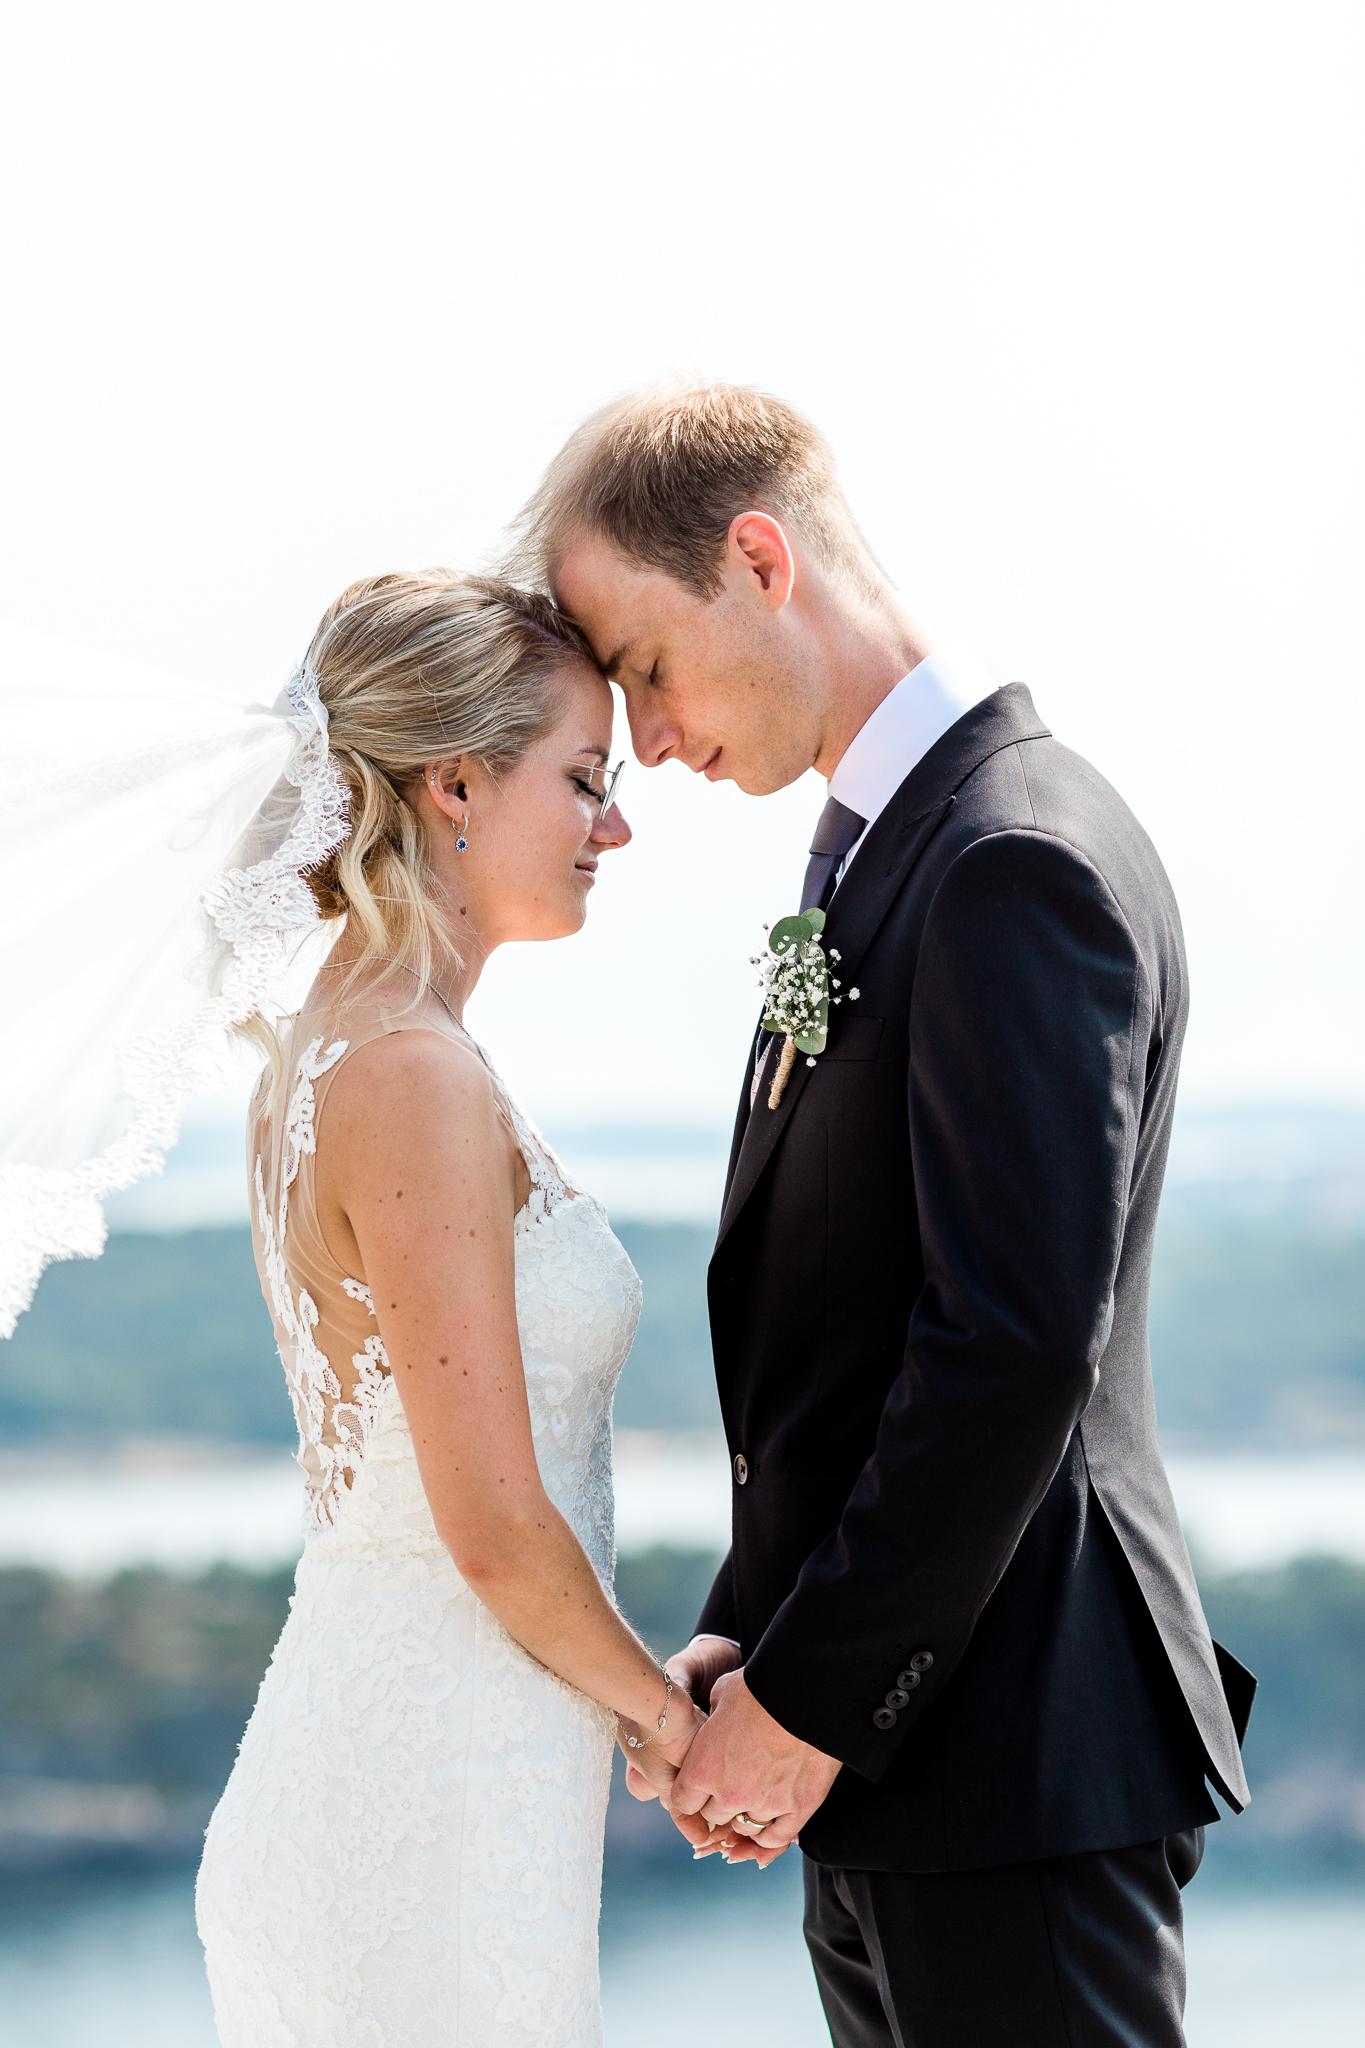 Bryllup_web18.jpg